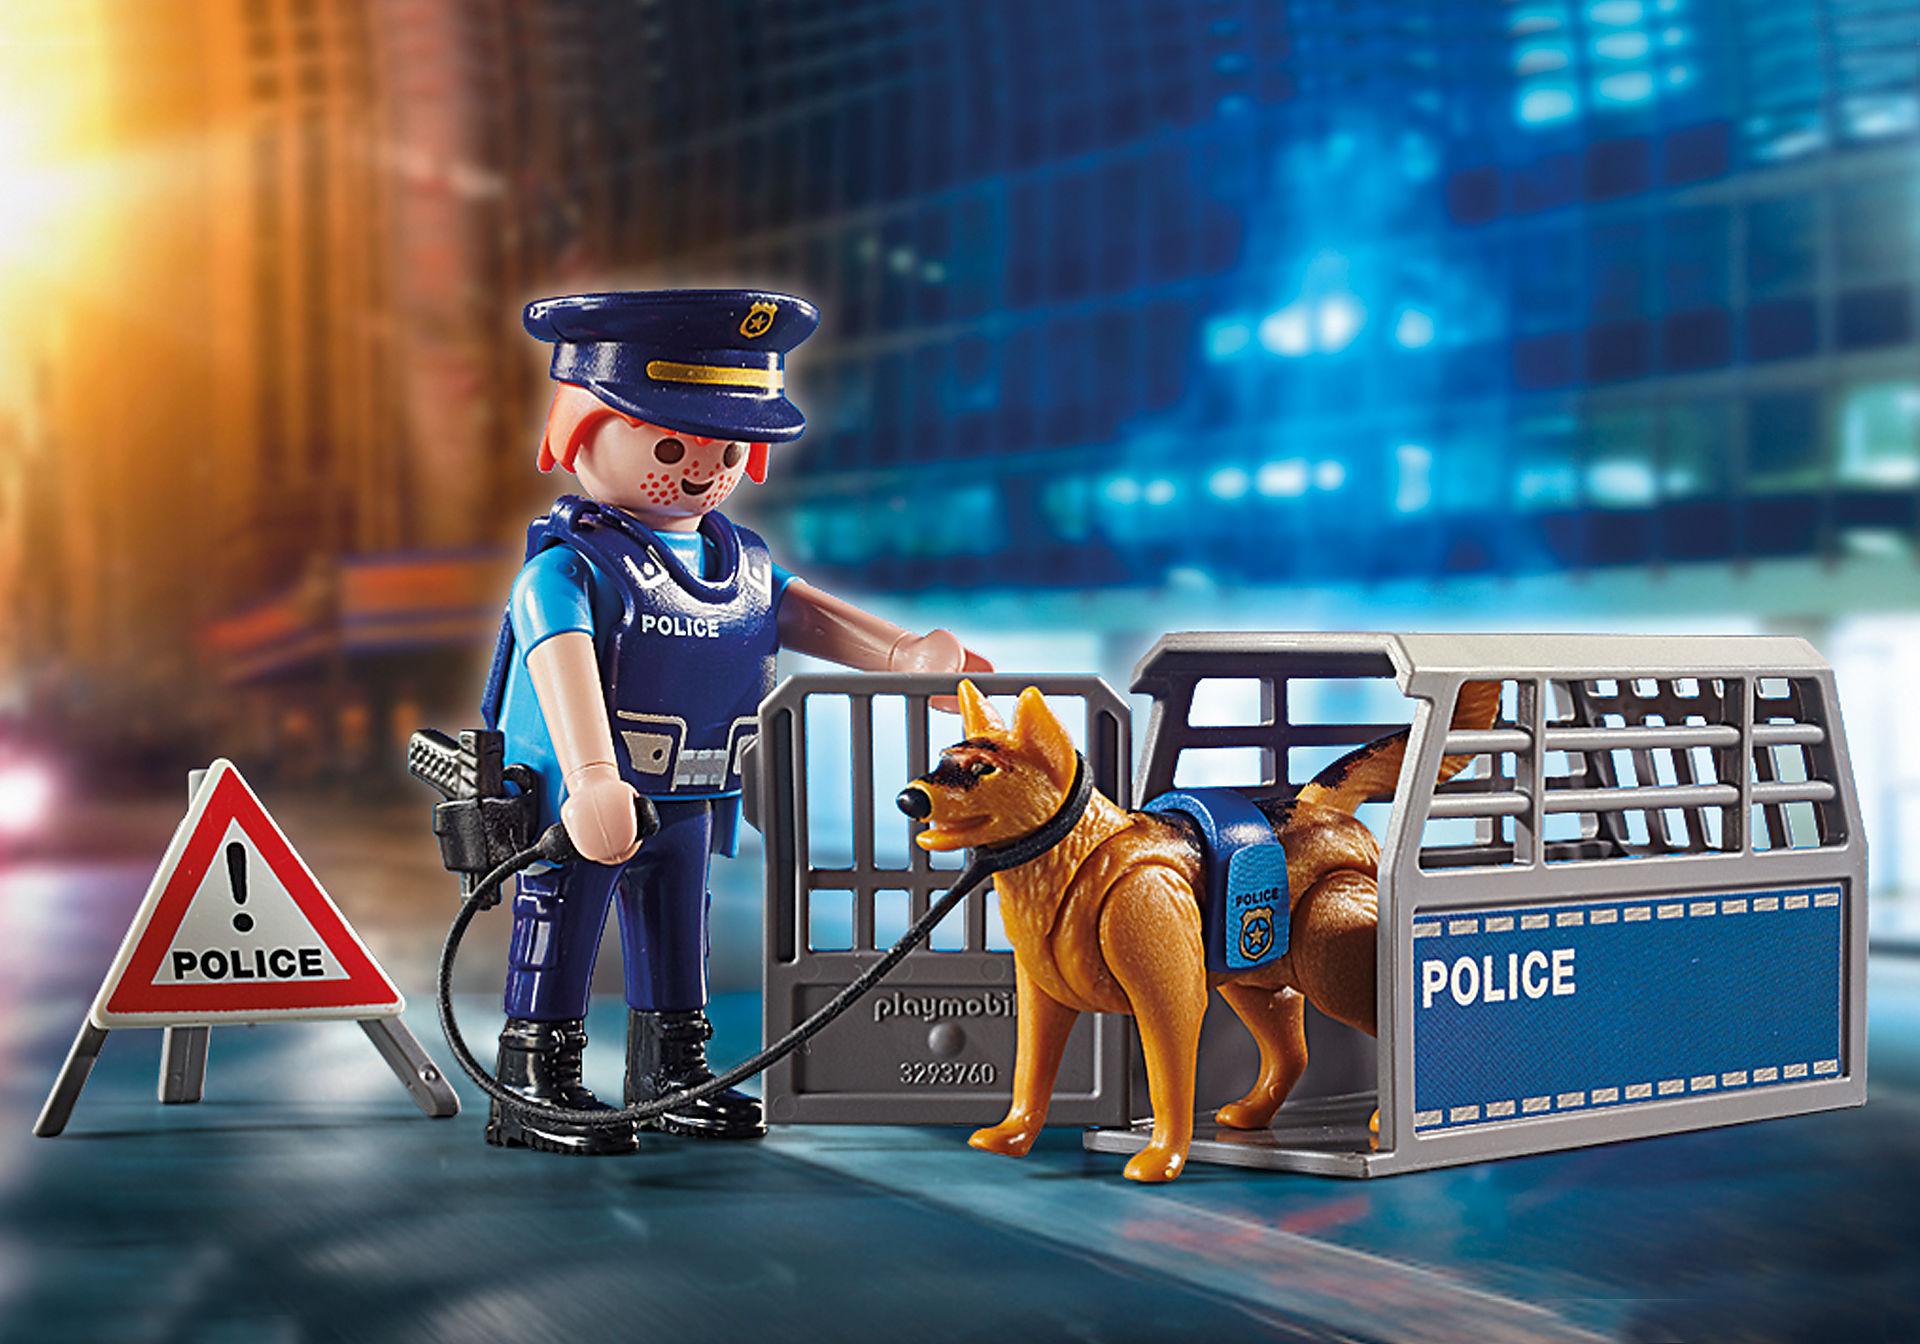 http://media.playmobil.com/i/playmobil/6878_product_extra1/Polizei-Straßensperre